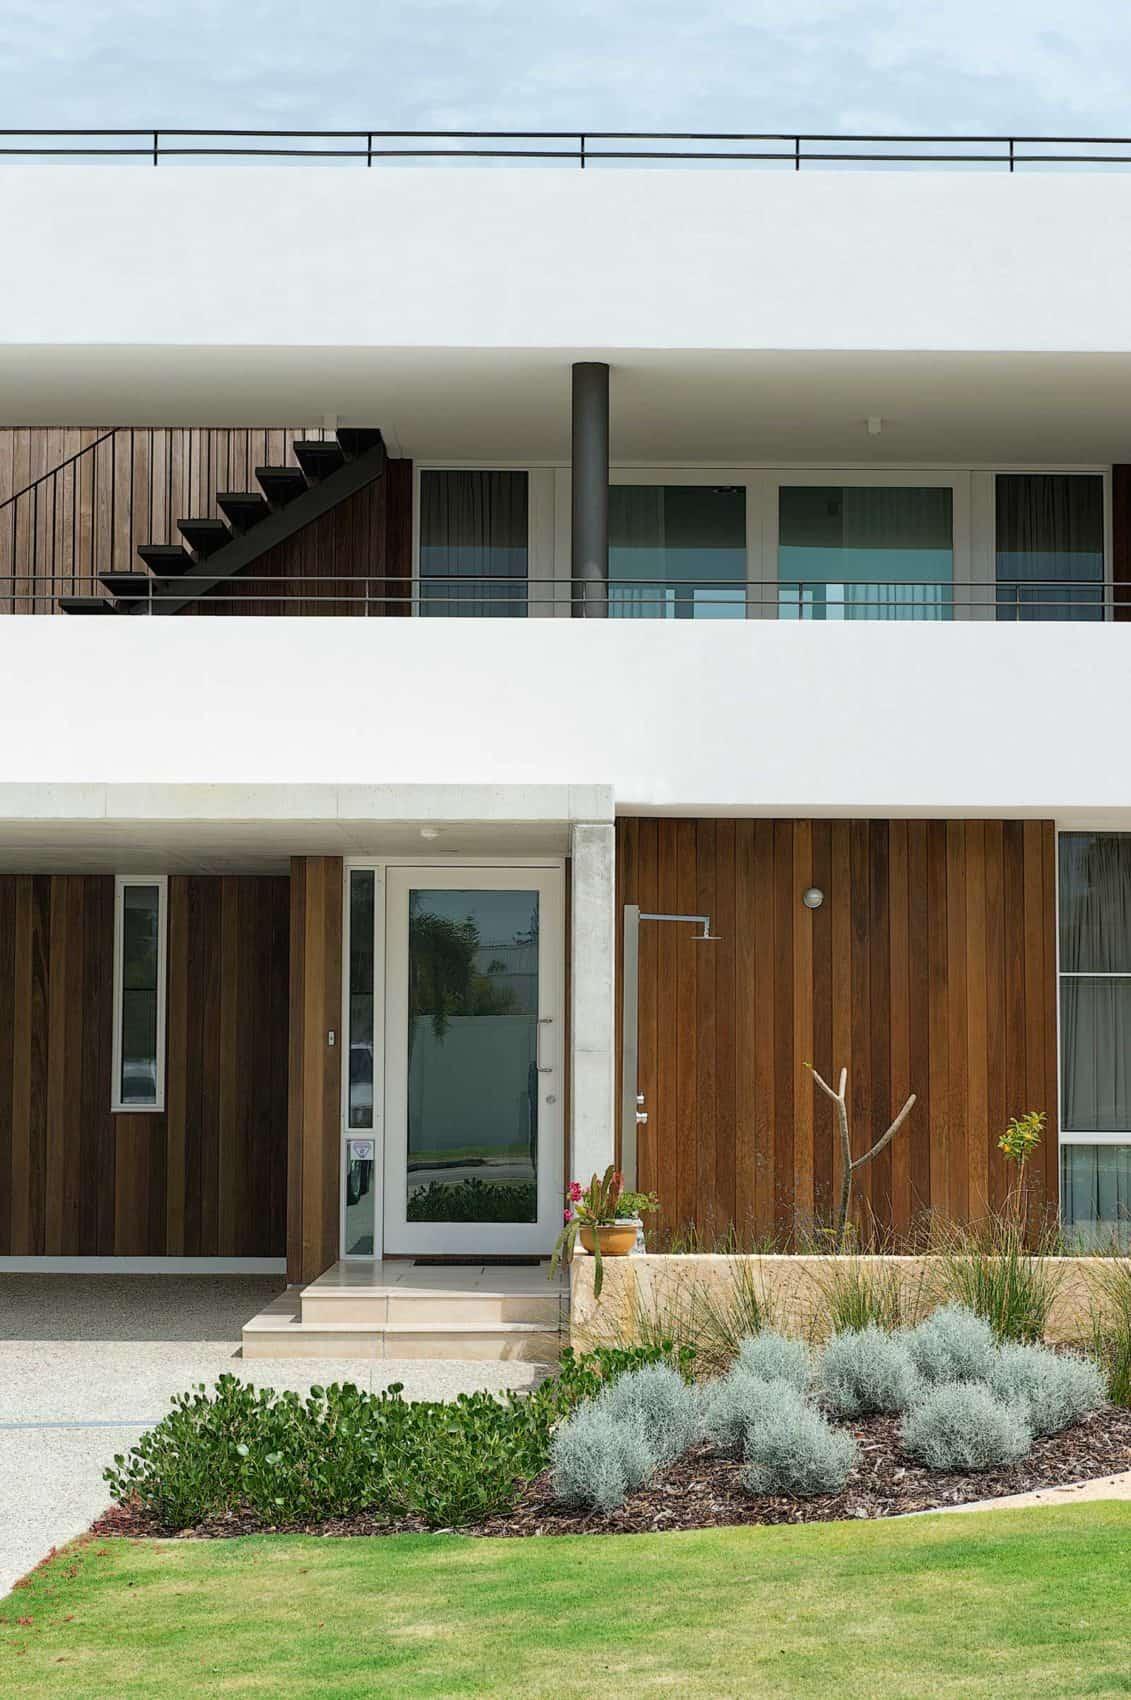 Eric Street House by Paul Burnham Architect (2)